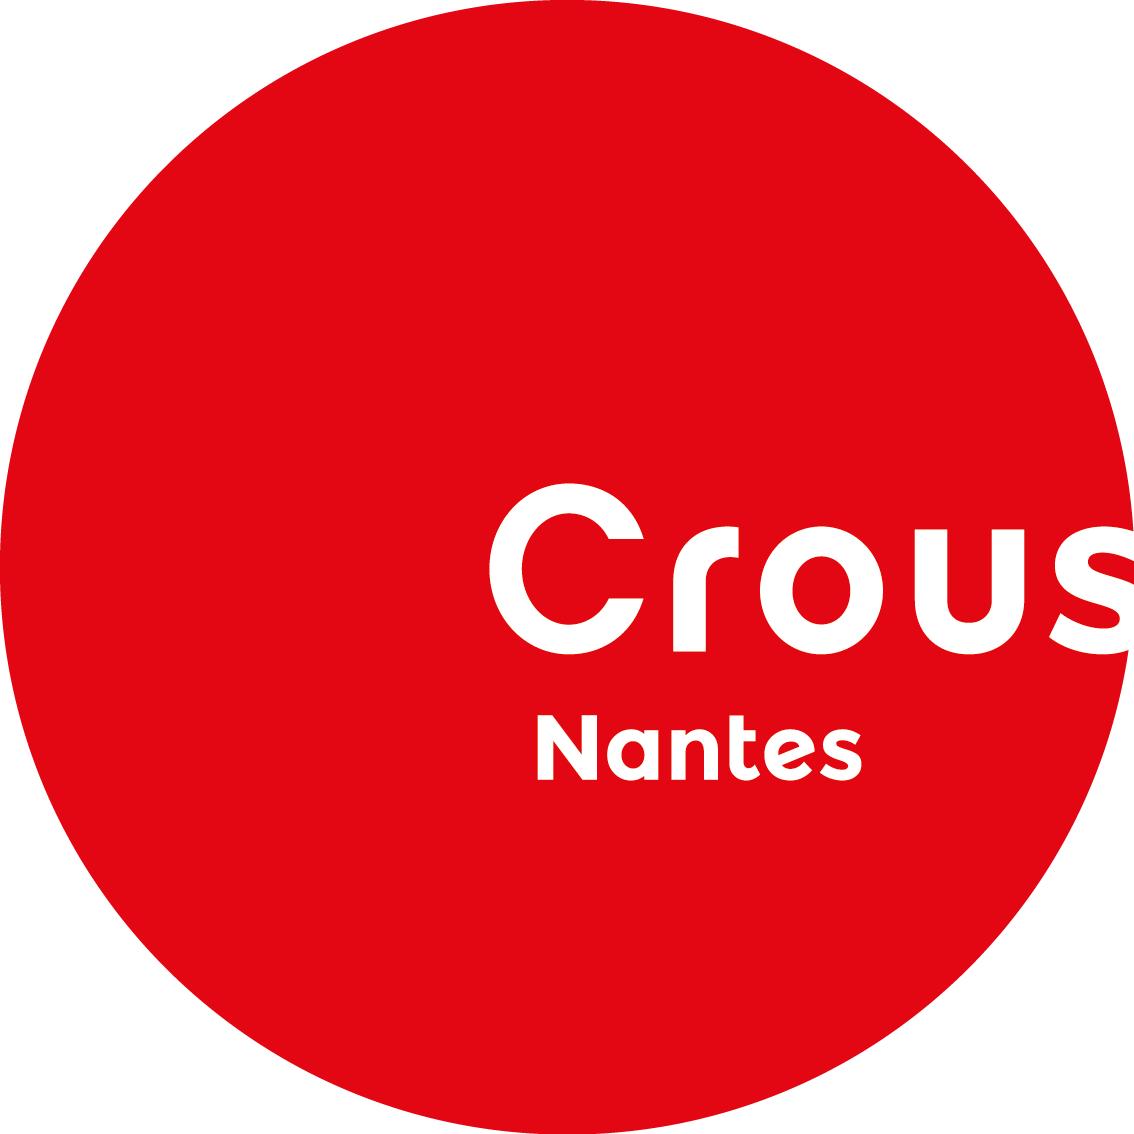 crous nantes